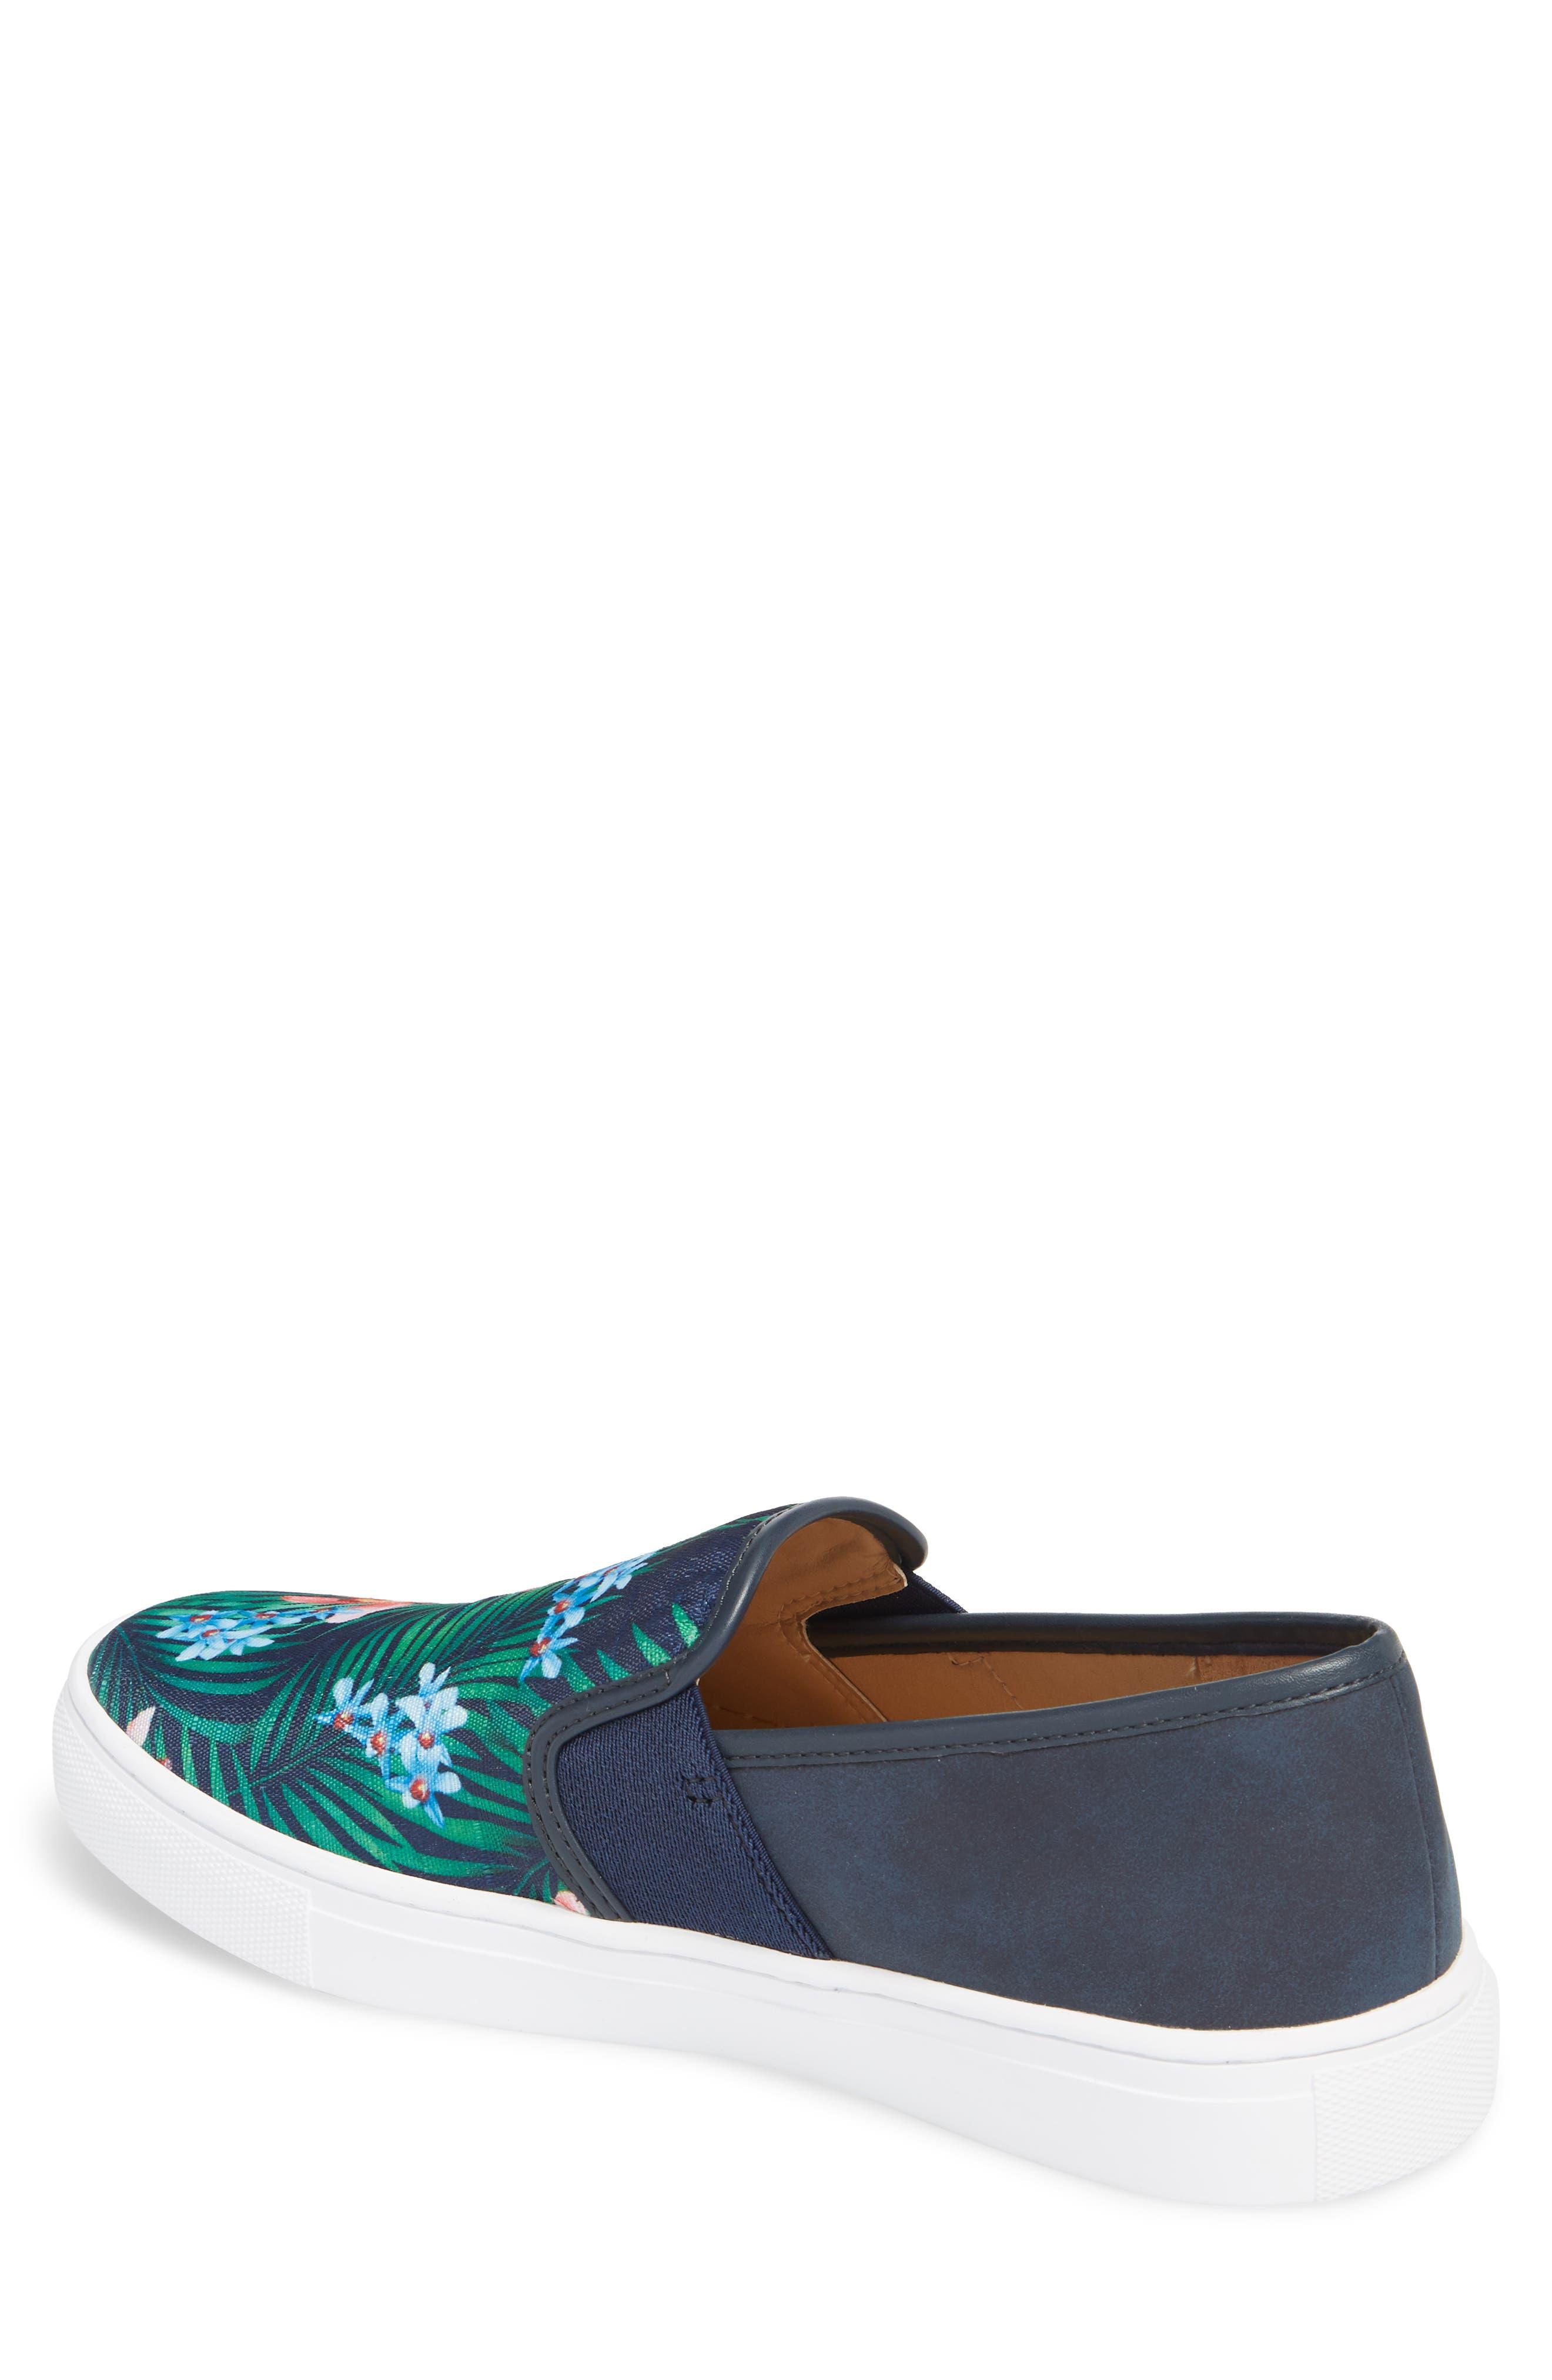 Fish 'N' Chips Bali Slip-On Sneaker,                             Alternate thumbnail 2, color,                             Navy Multi Fabric